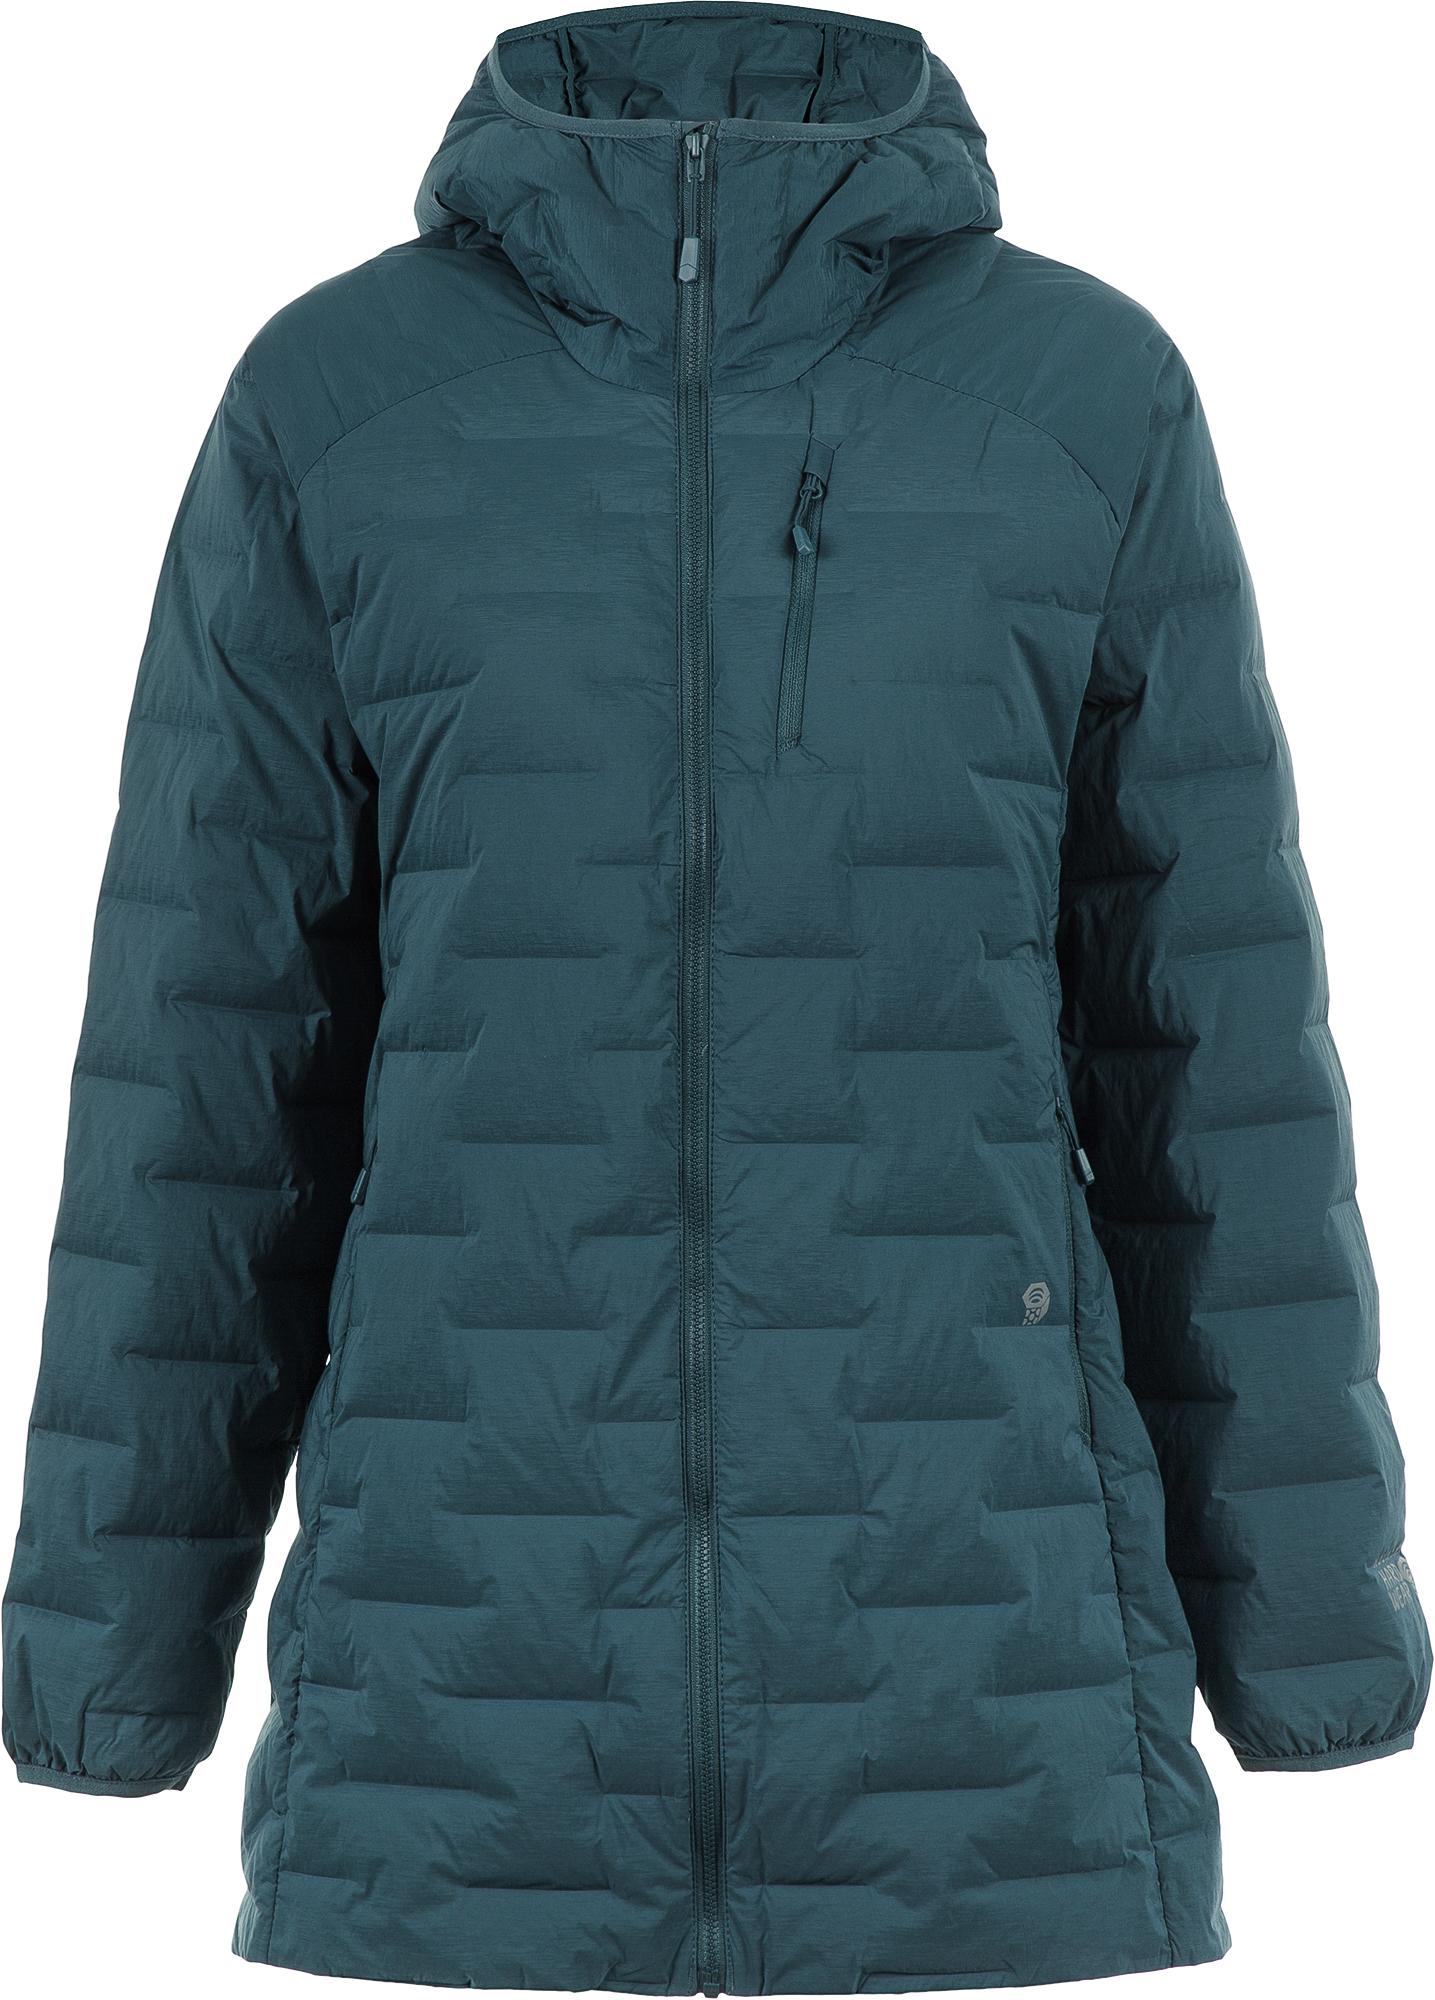 Mountain Hardwear Куртка пуховая женская Mountain Hardwear Super/DS™, размер 50 цена